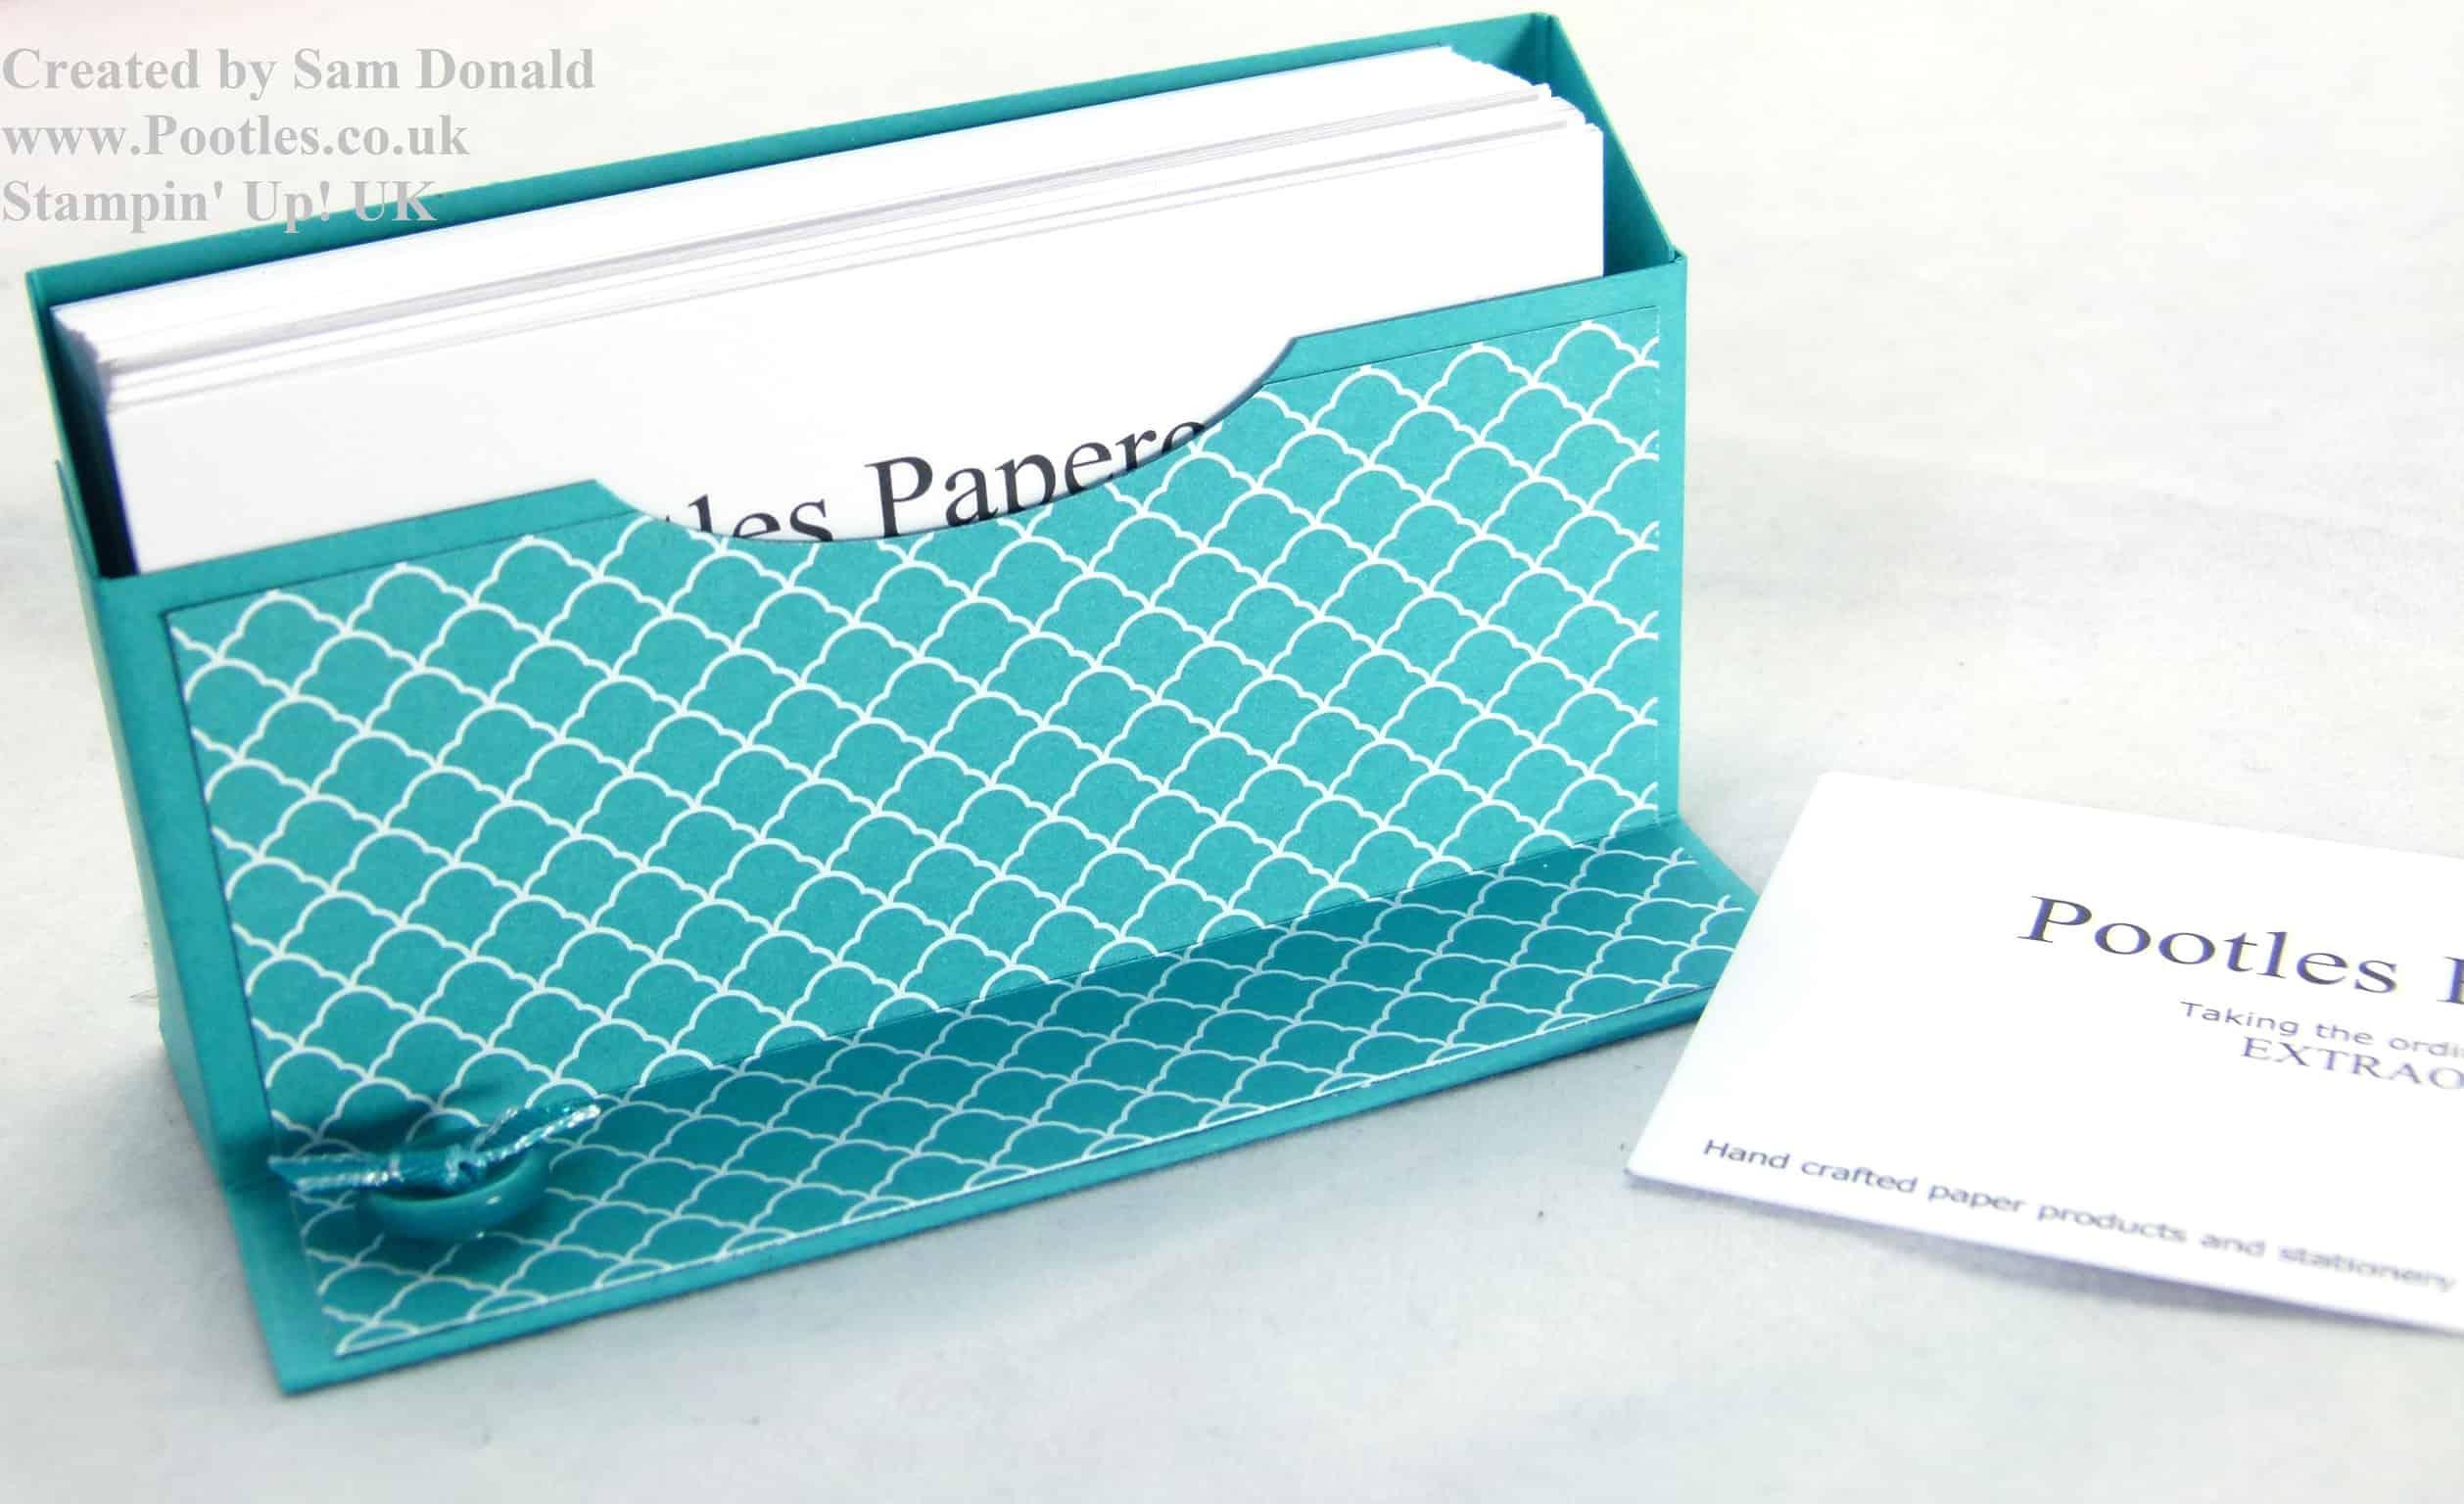 Pootles Stampin Up UK Business Card Holder tutorial (2)